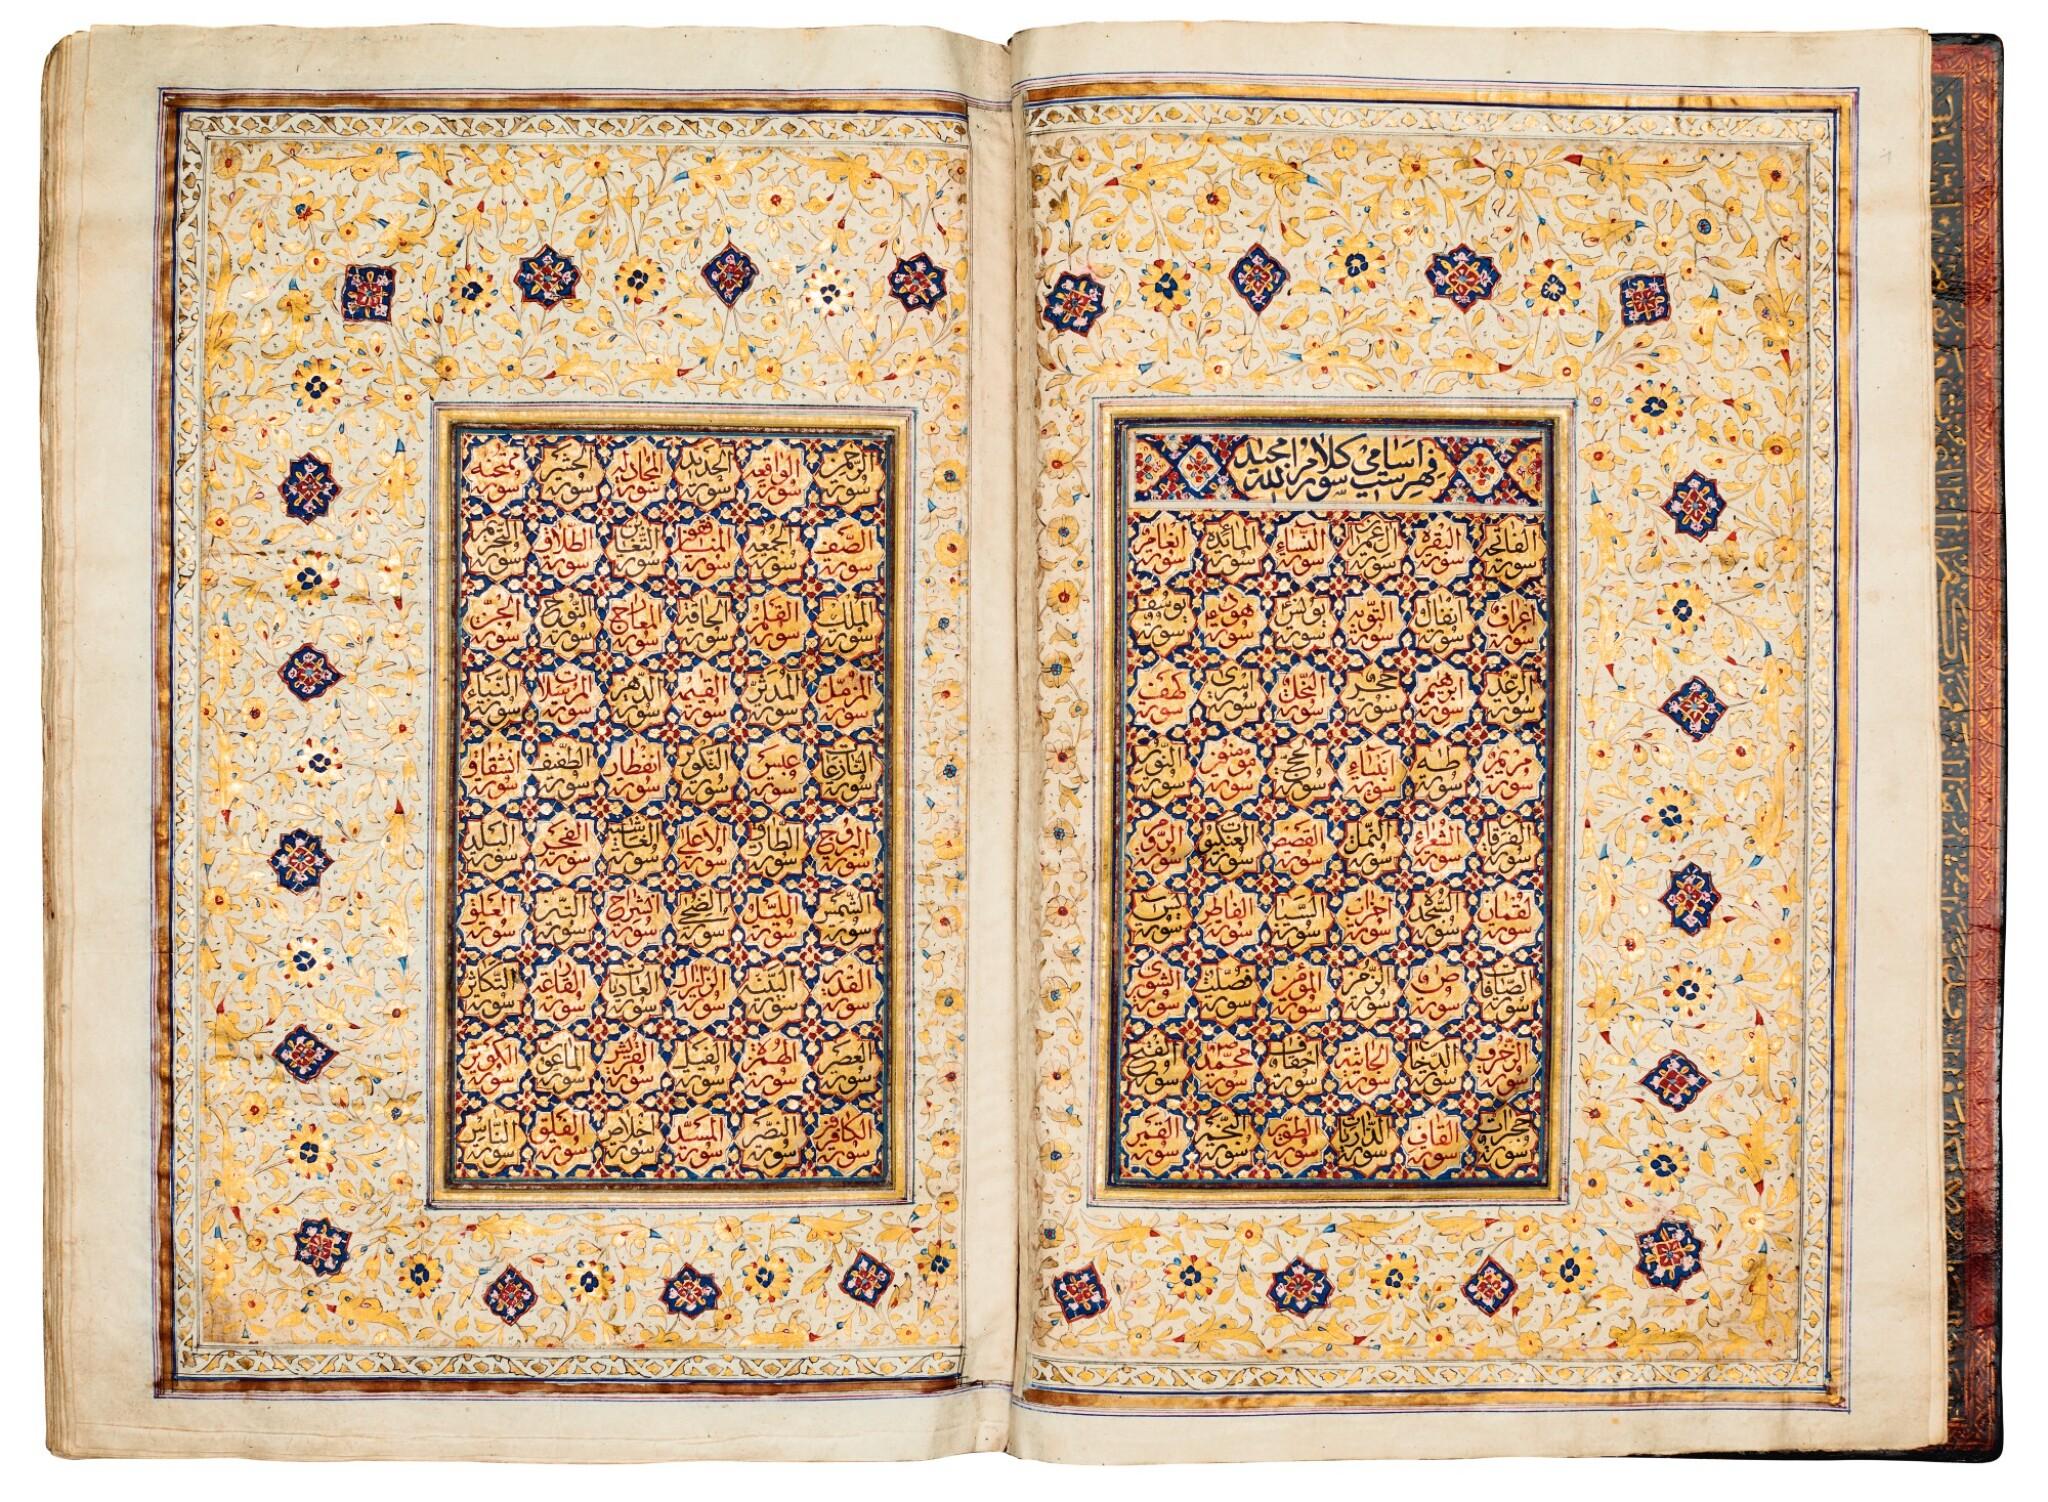 View full screen - View 1 of Lot 24. Qur'an. copied by Ahmad al-Nayrizi, illuminated. Persia, Safavid and Qajar. 1122 AH/1710 AD.